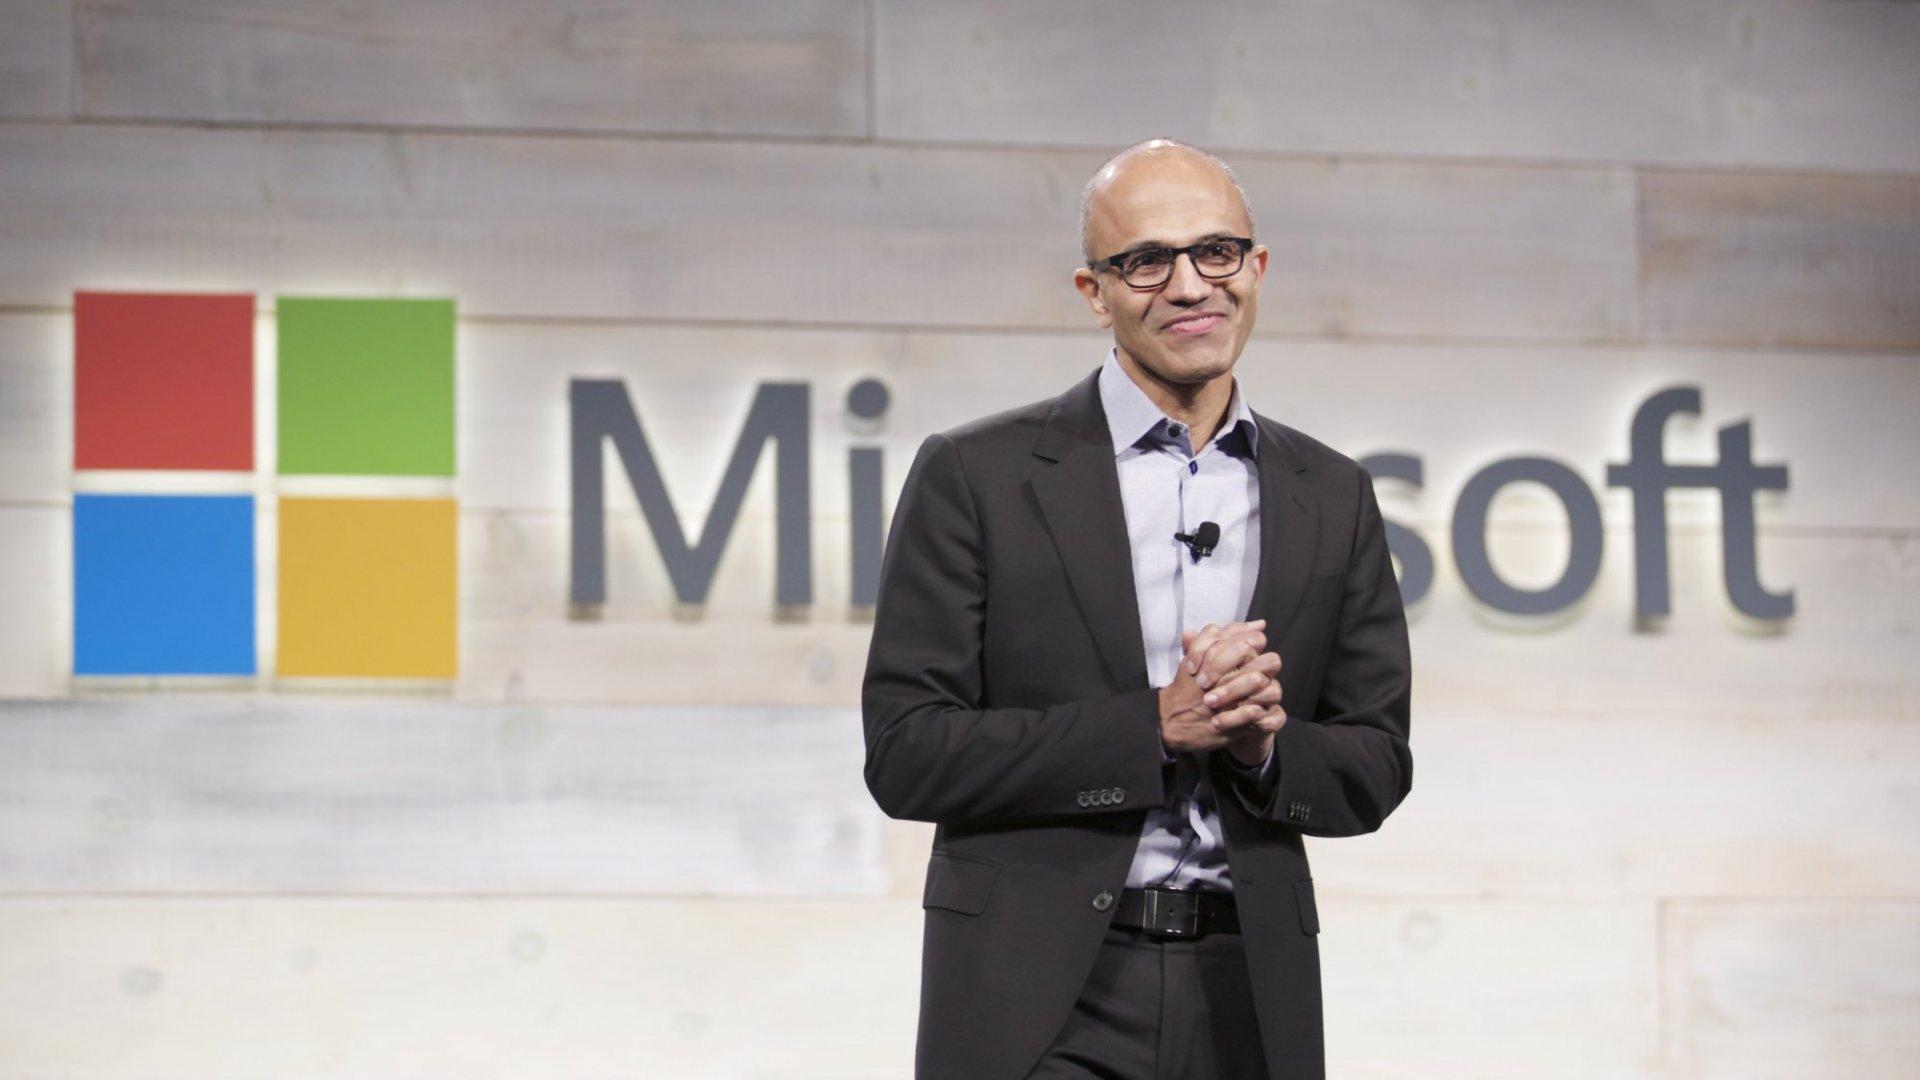 The Best Advice Bill Gates Gave to Microsoft CEO Satya Nadella